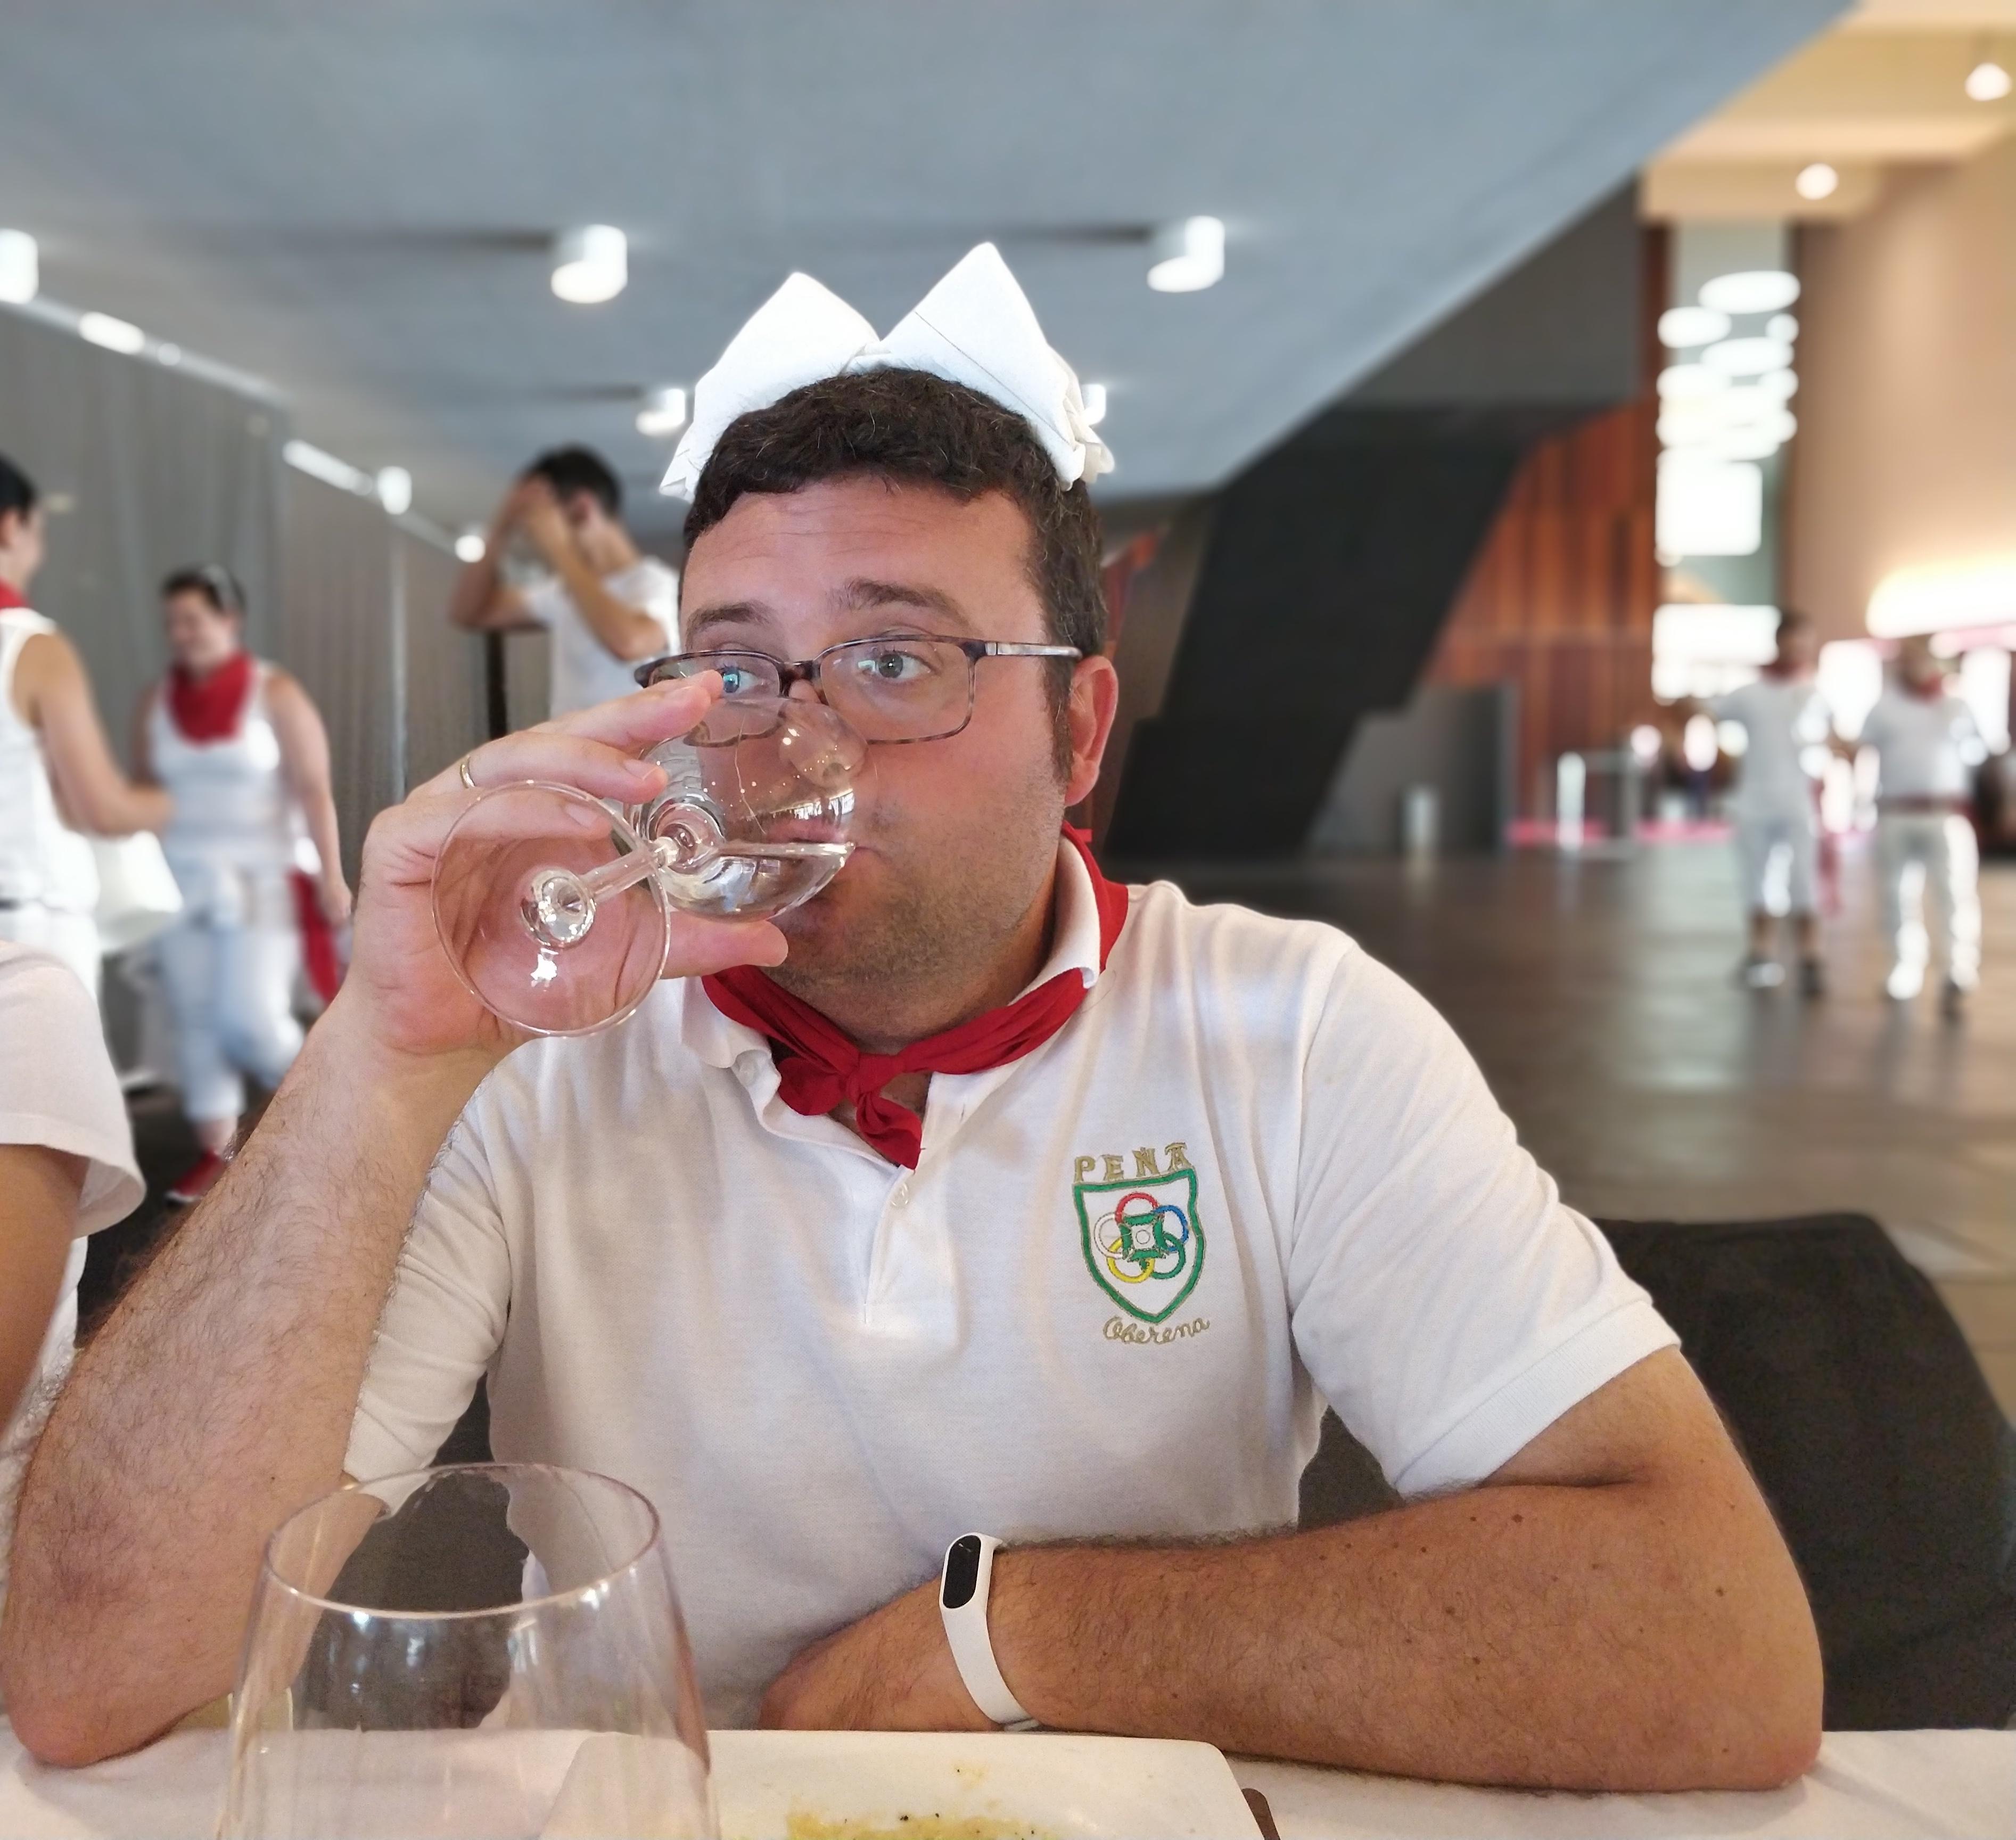 Pedro, el puto amo, mi profesor de la fiesta, mi hermano de otra madre, en la comida de la Peña Oberena Sanfermin 2018